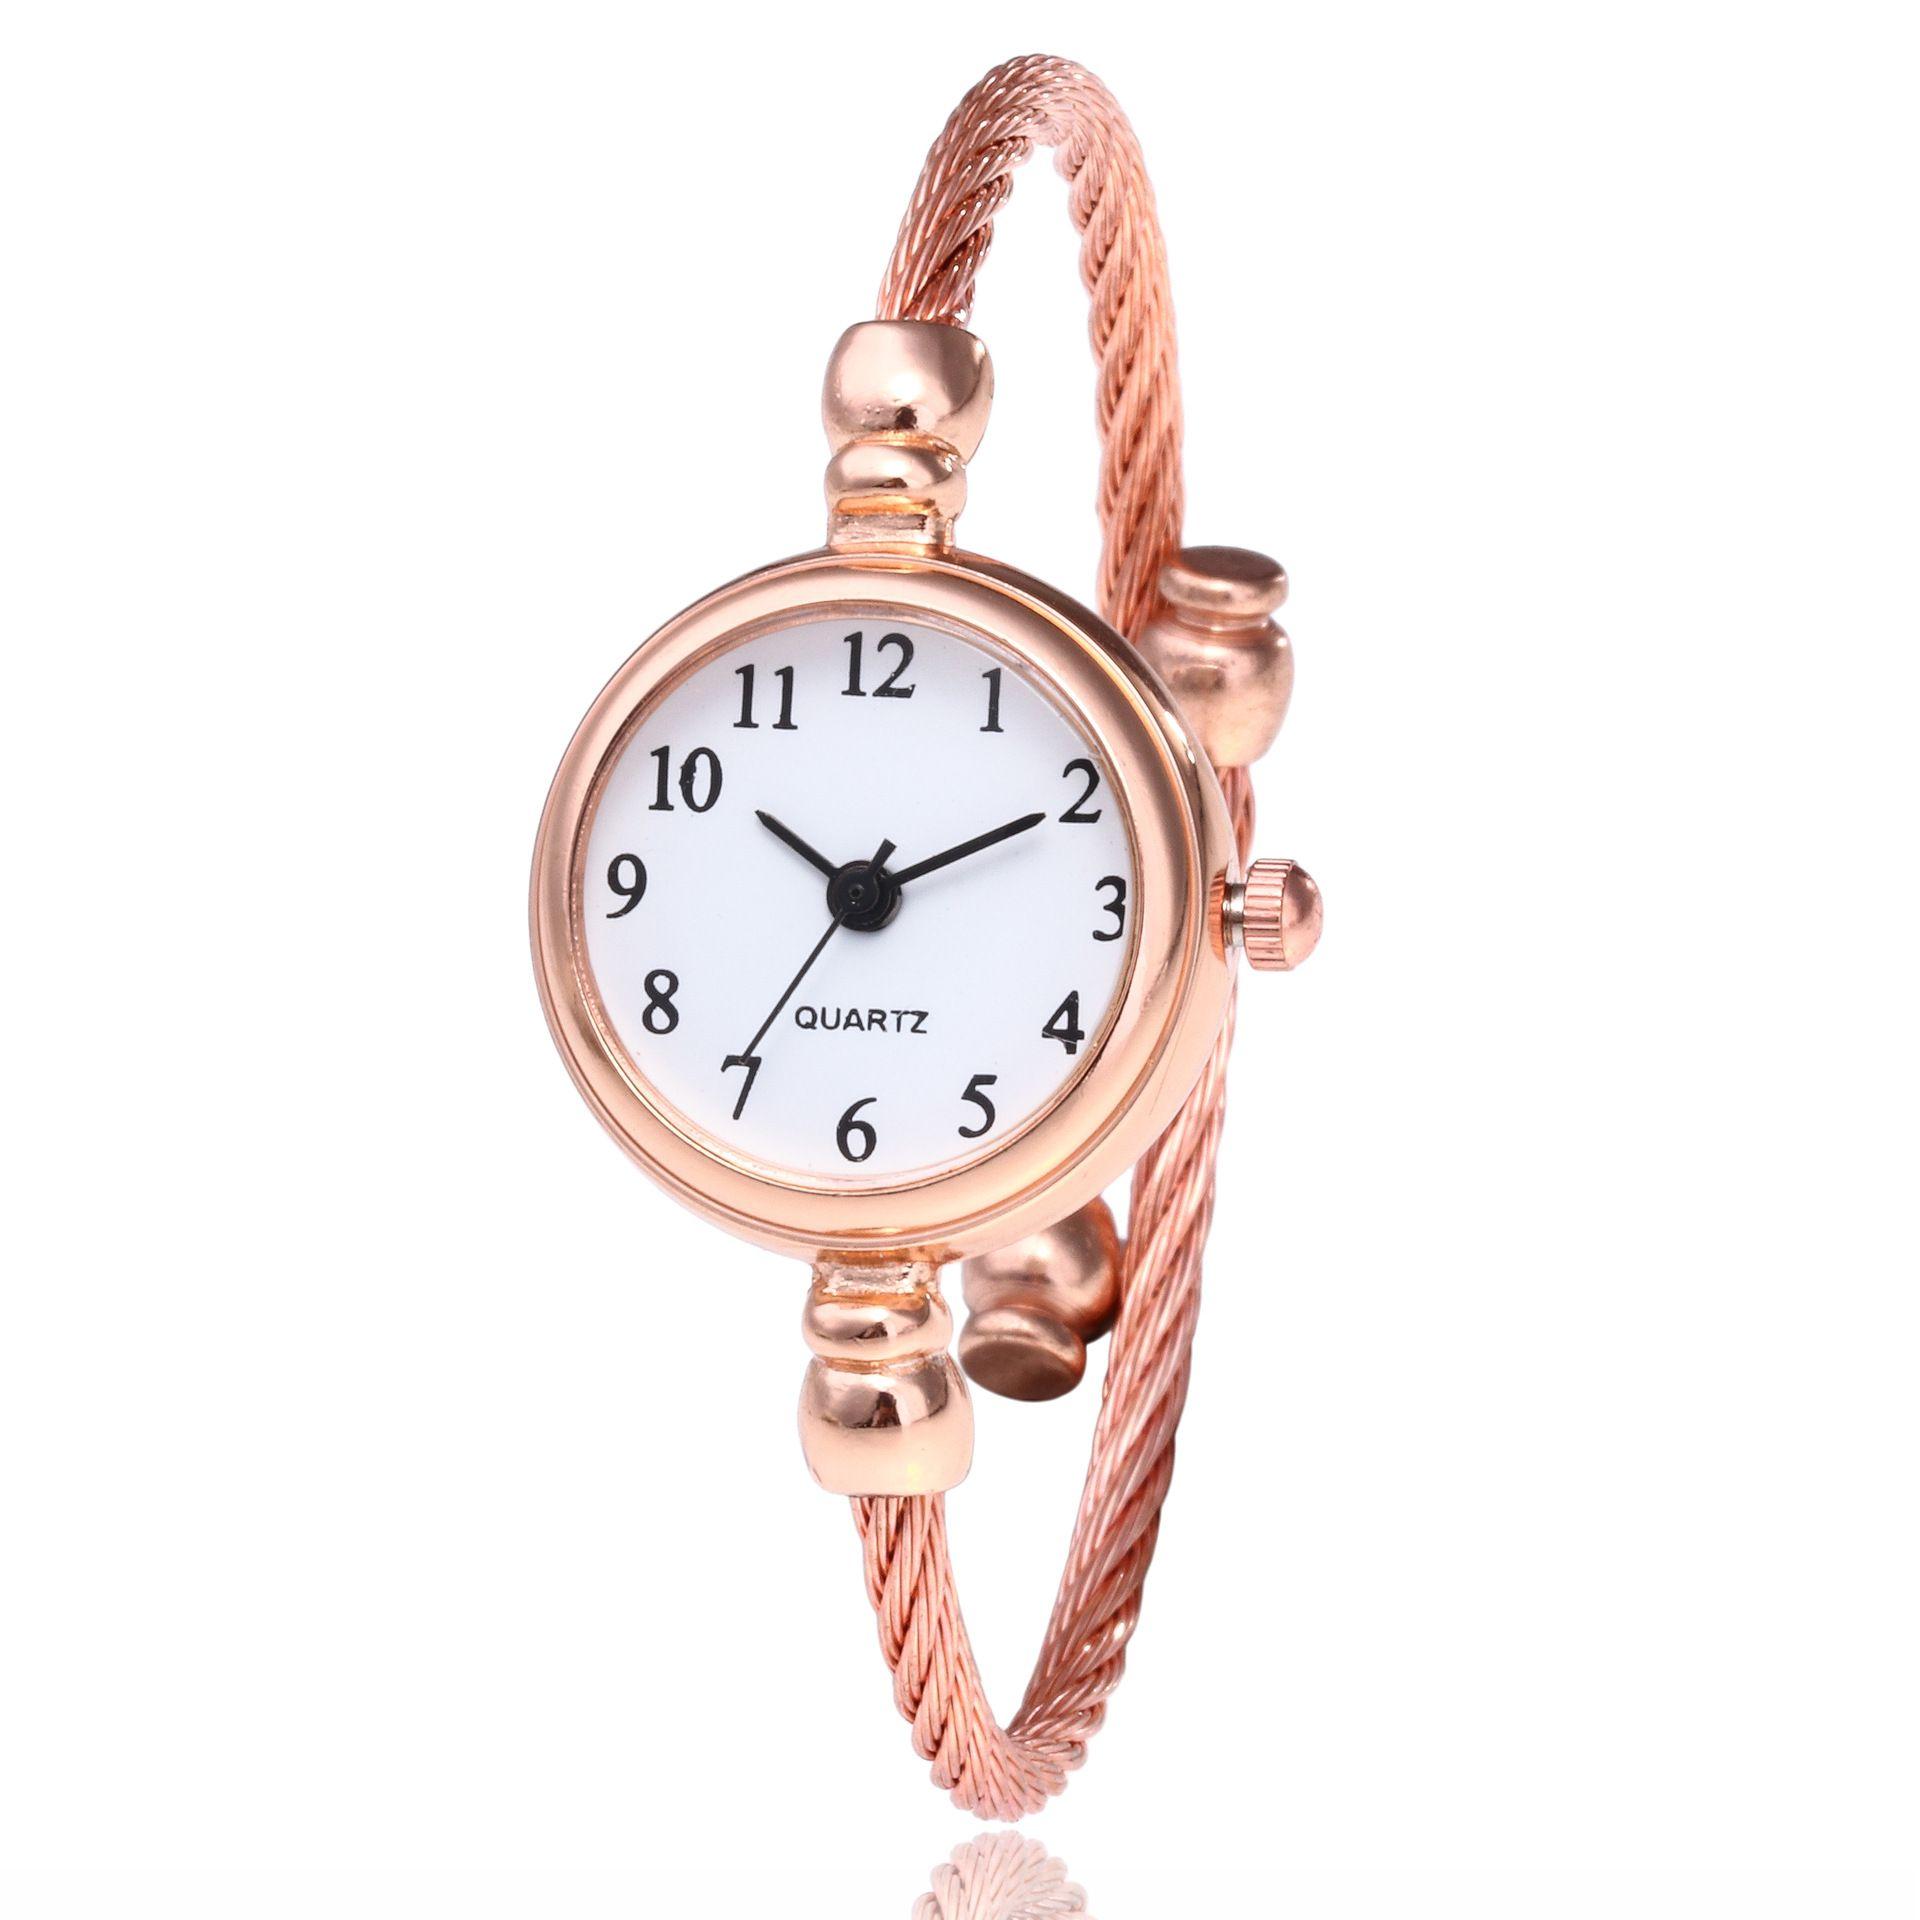 a3e066c4bba Compre Moda Simples Corda Mulheres Senhoras Roma Números Pequenos Mostrador  Pulseira Relógios Por Atacado Lady Feminino Vestido De Quartzo Relógios De  Pulso ...